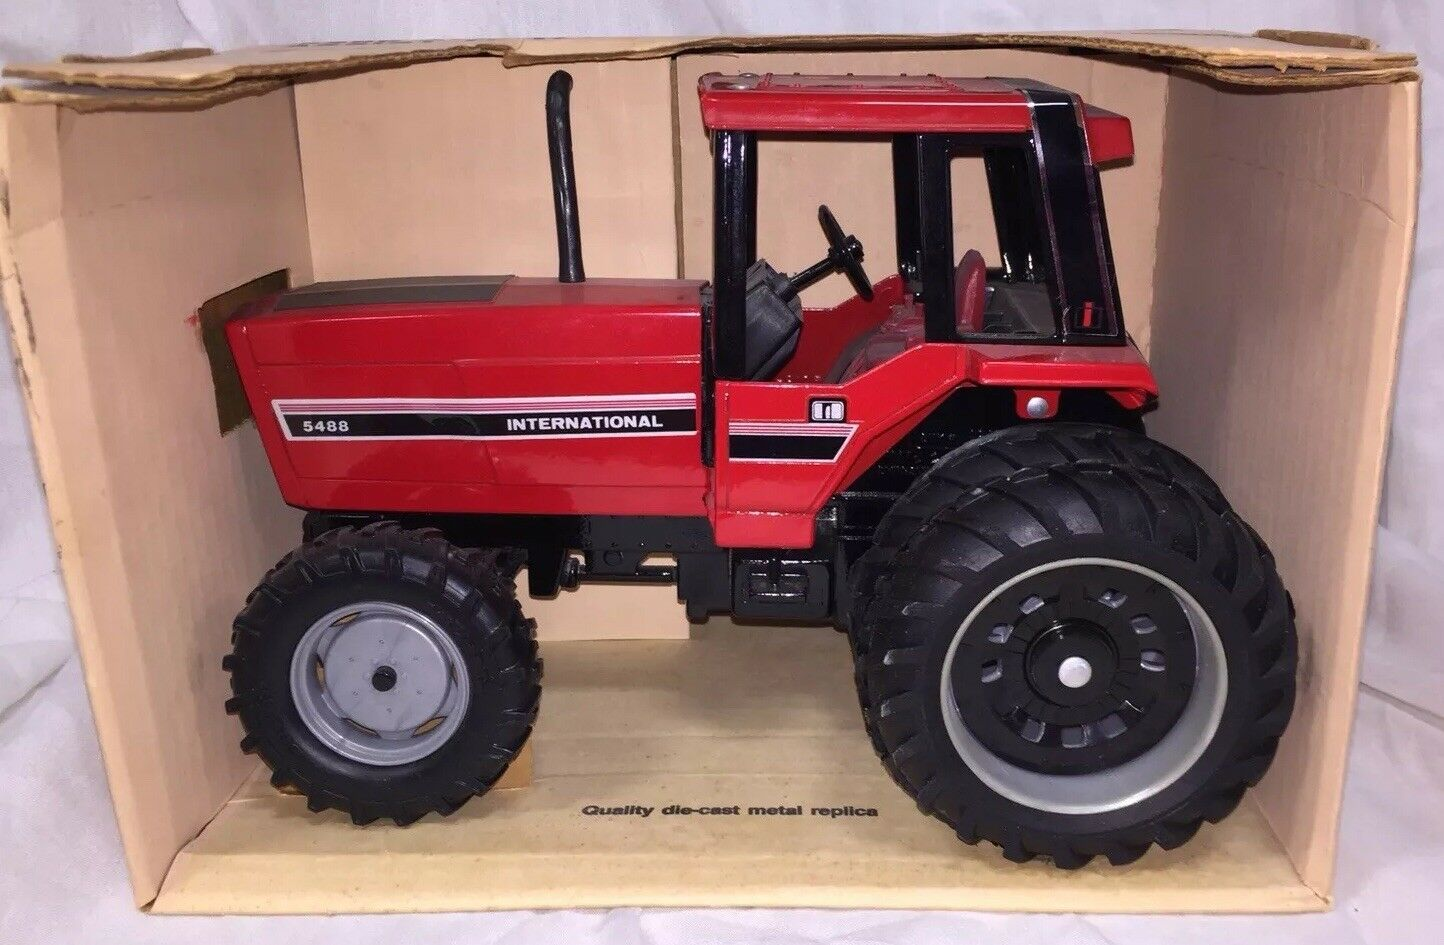 ERTL International Harvester 5488 FWA  Tractor with Duals  1 16 NIB  100% garantie d'ajustement